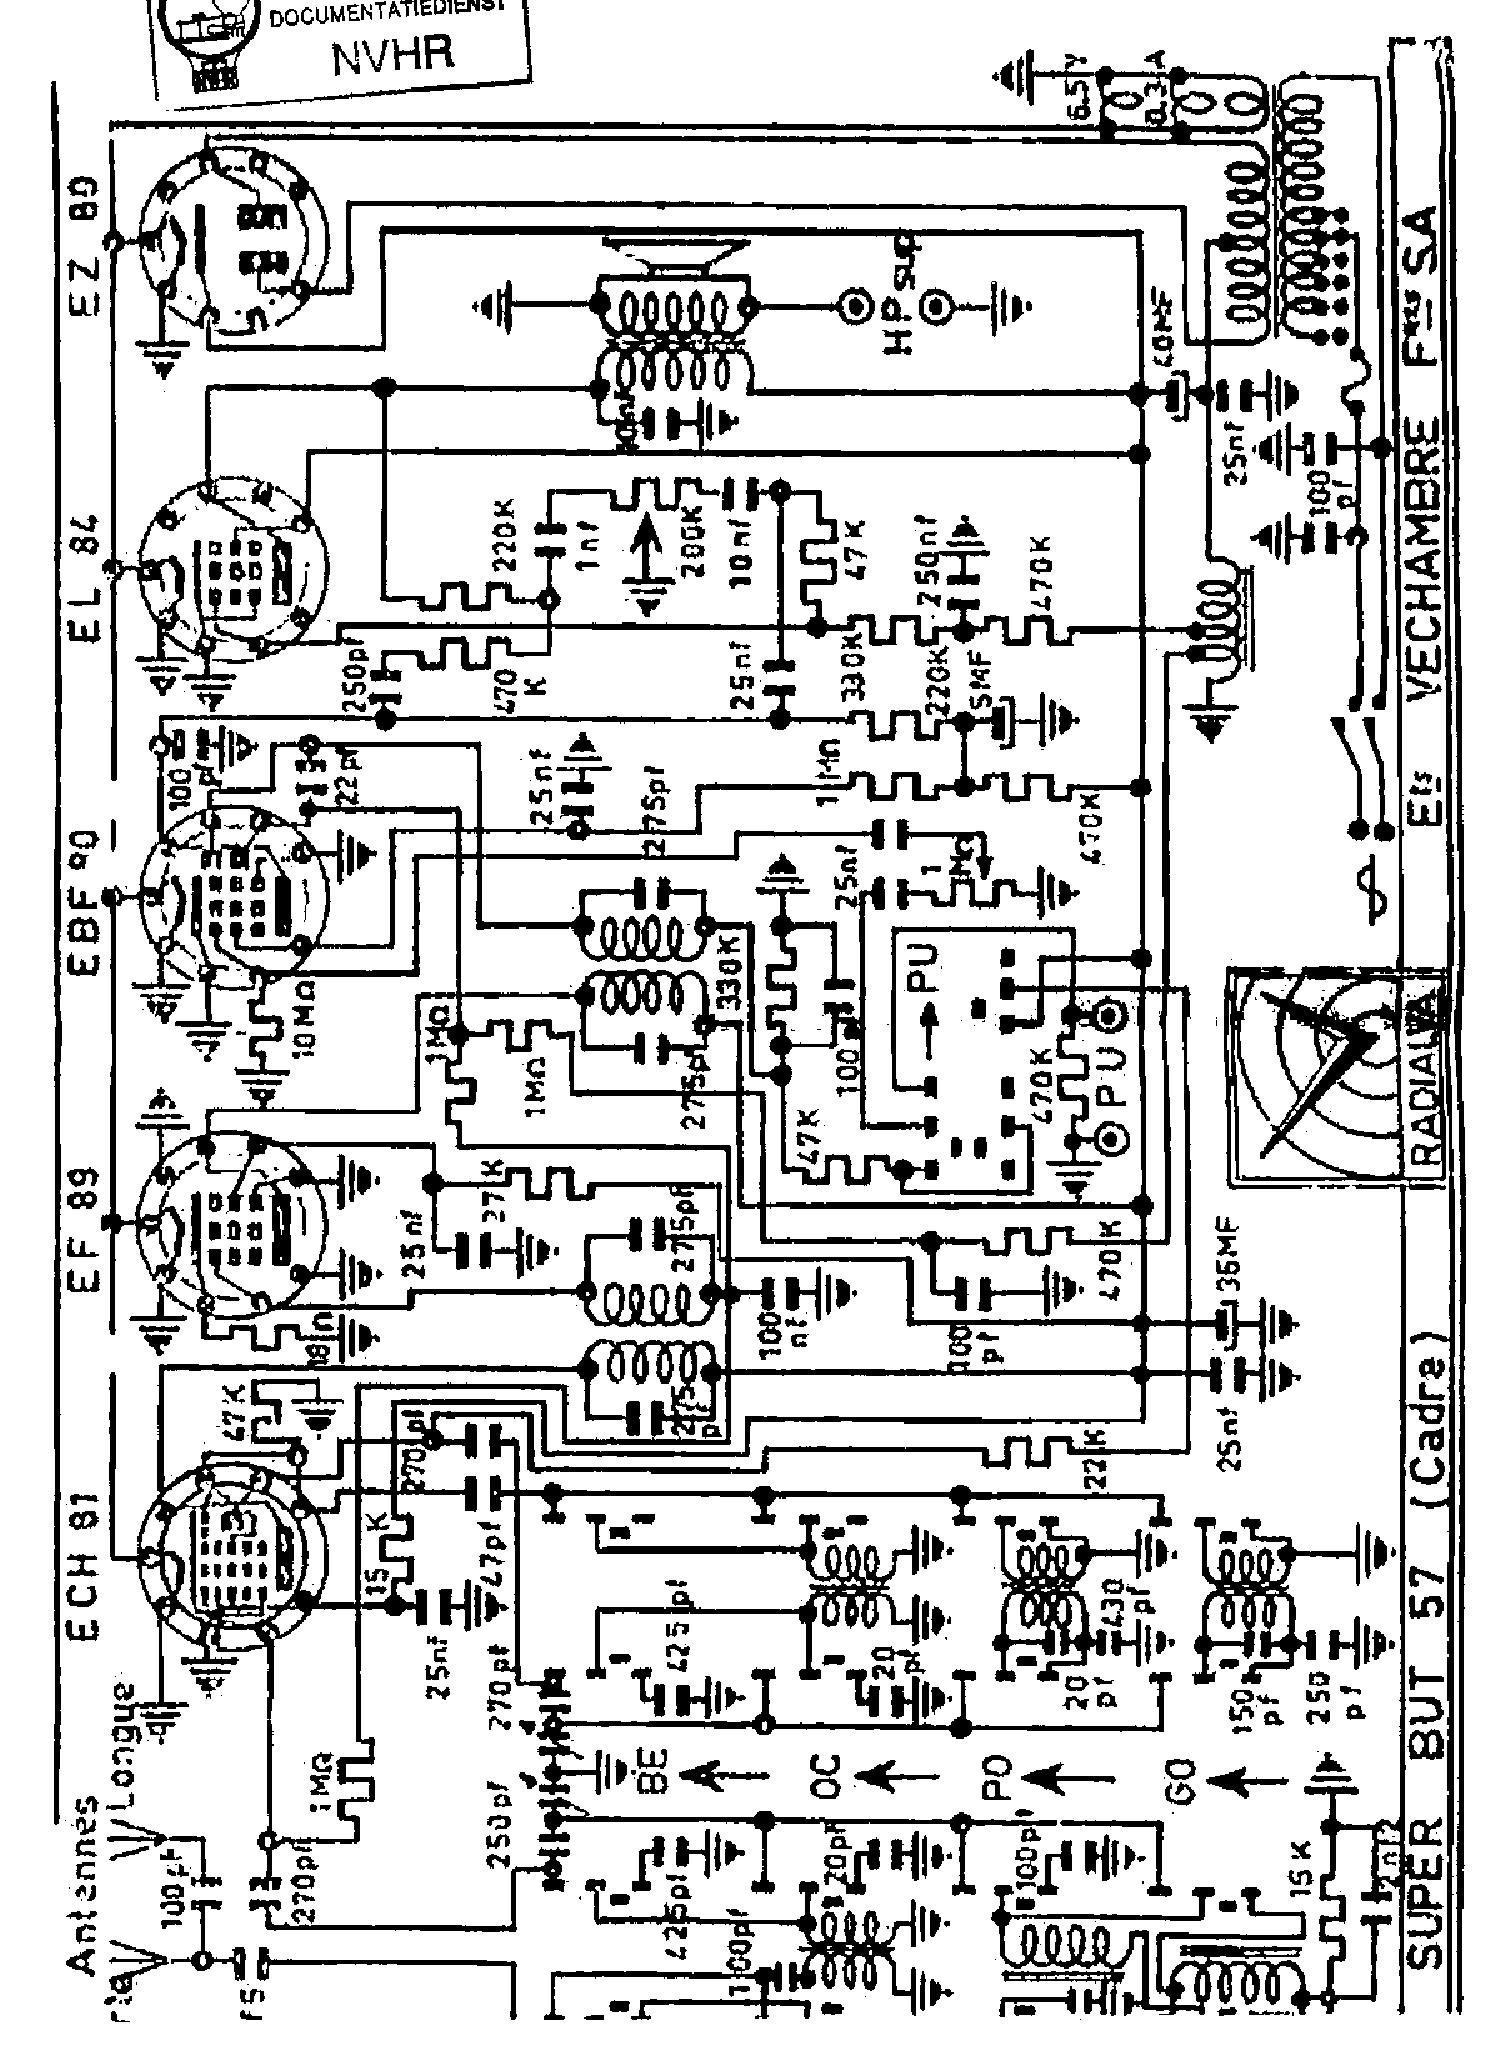 radialva super but 57 ac receiver sch service manual download Typical a C Wiring Diagram radialva super but 57 ac receiver sch service manual 1st page